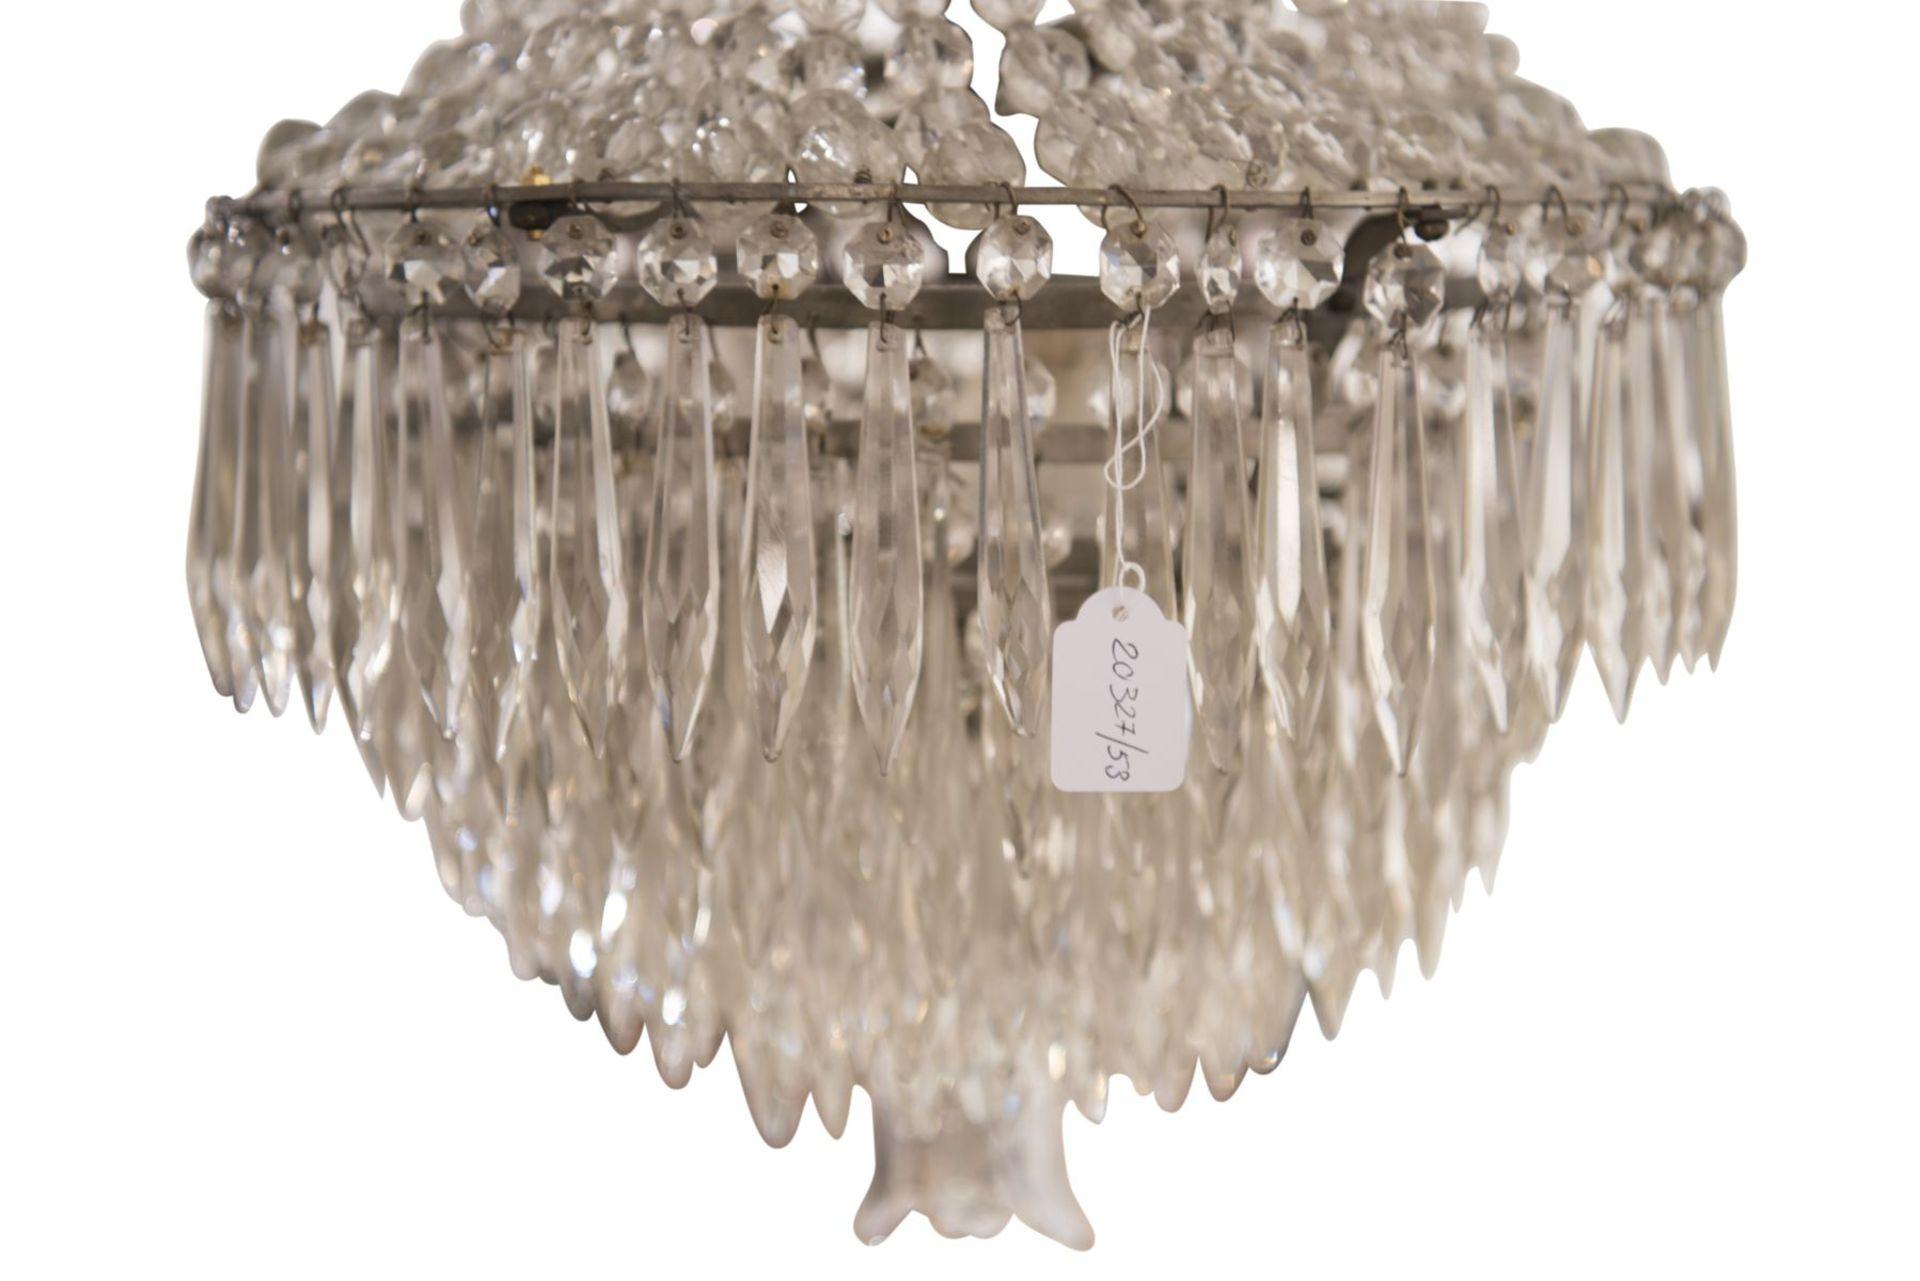 Decorative chandelier - Image 3 of 4